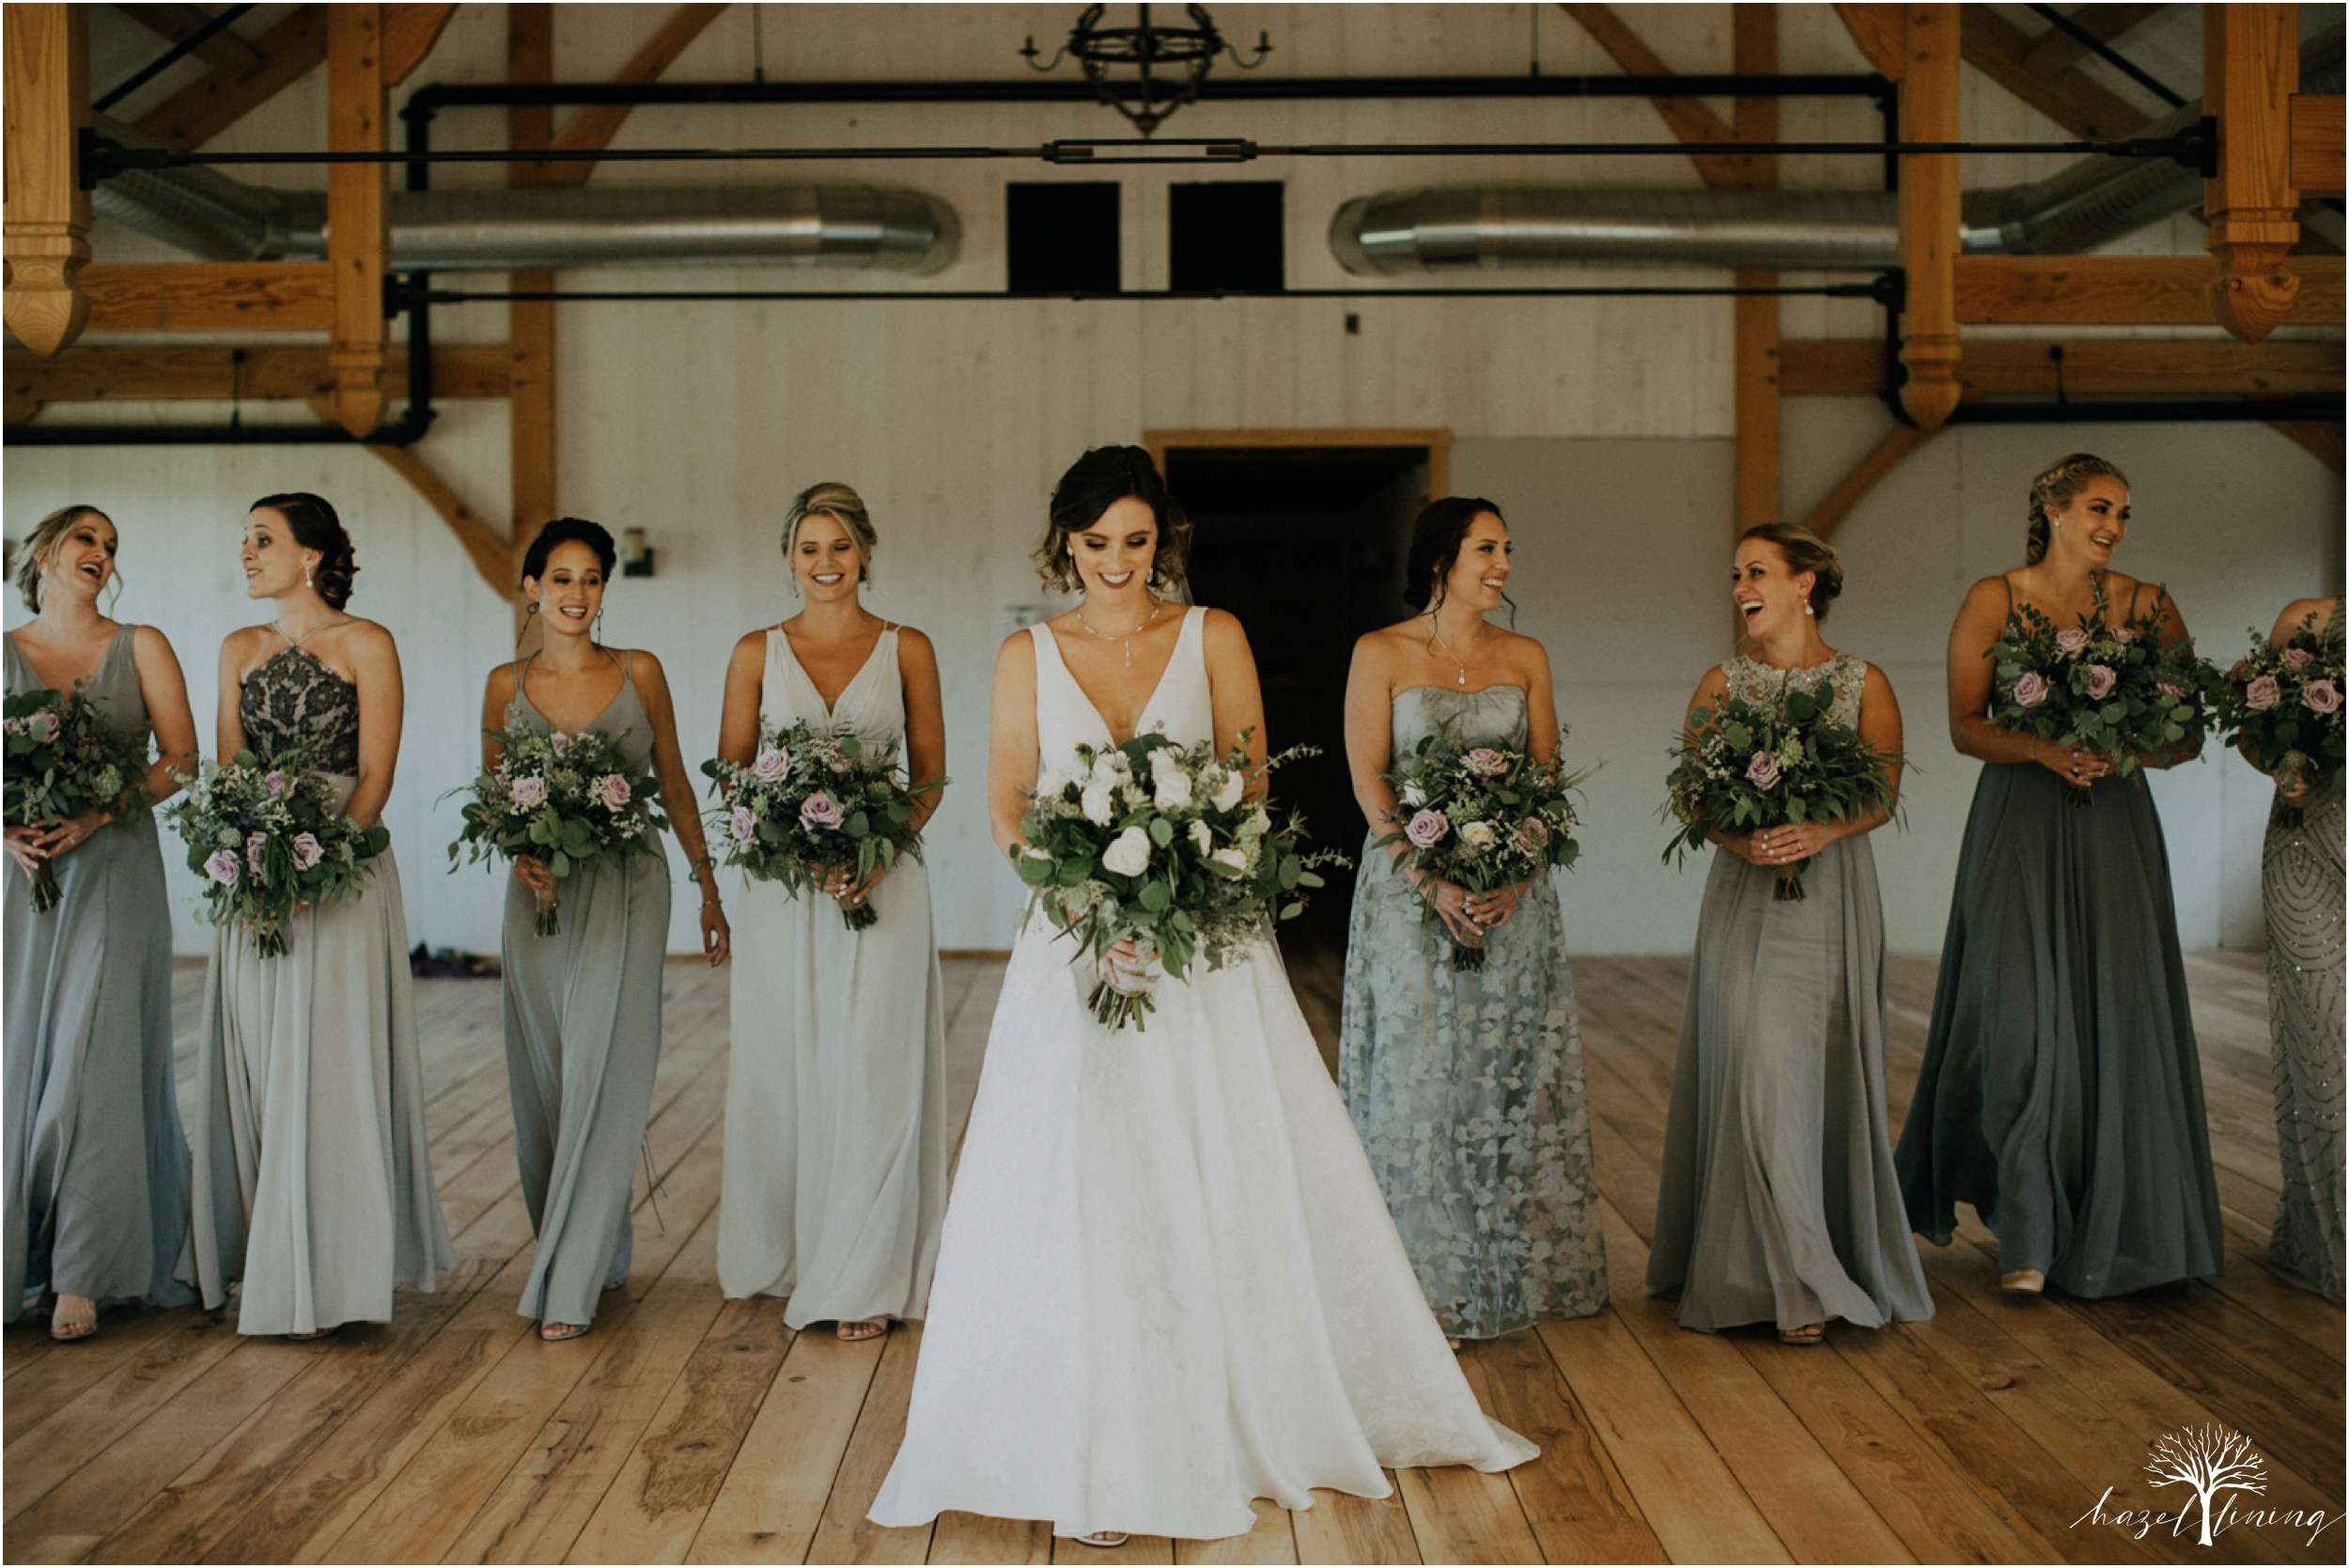 maureen-hepner-anthony-giordano-rose-bank-winery-newtow-pennsylvania-luxury-summer-wedding-hazel-lining-photography-destination-elopement-wedding-engagement-photography_0032.jpg